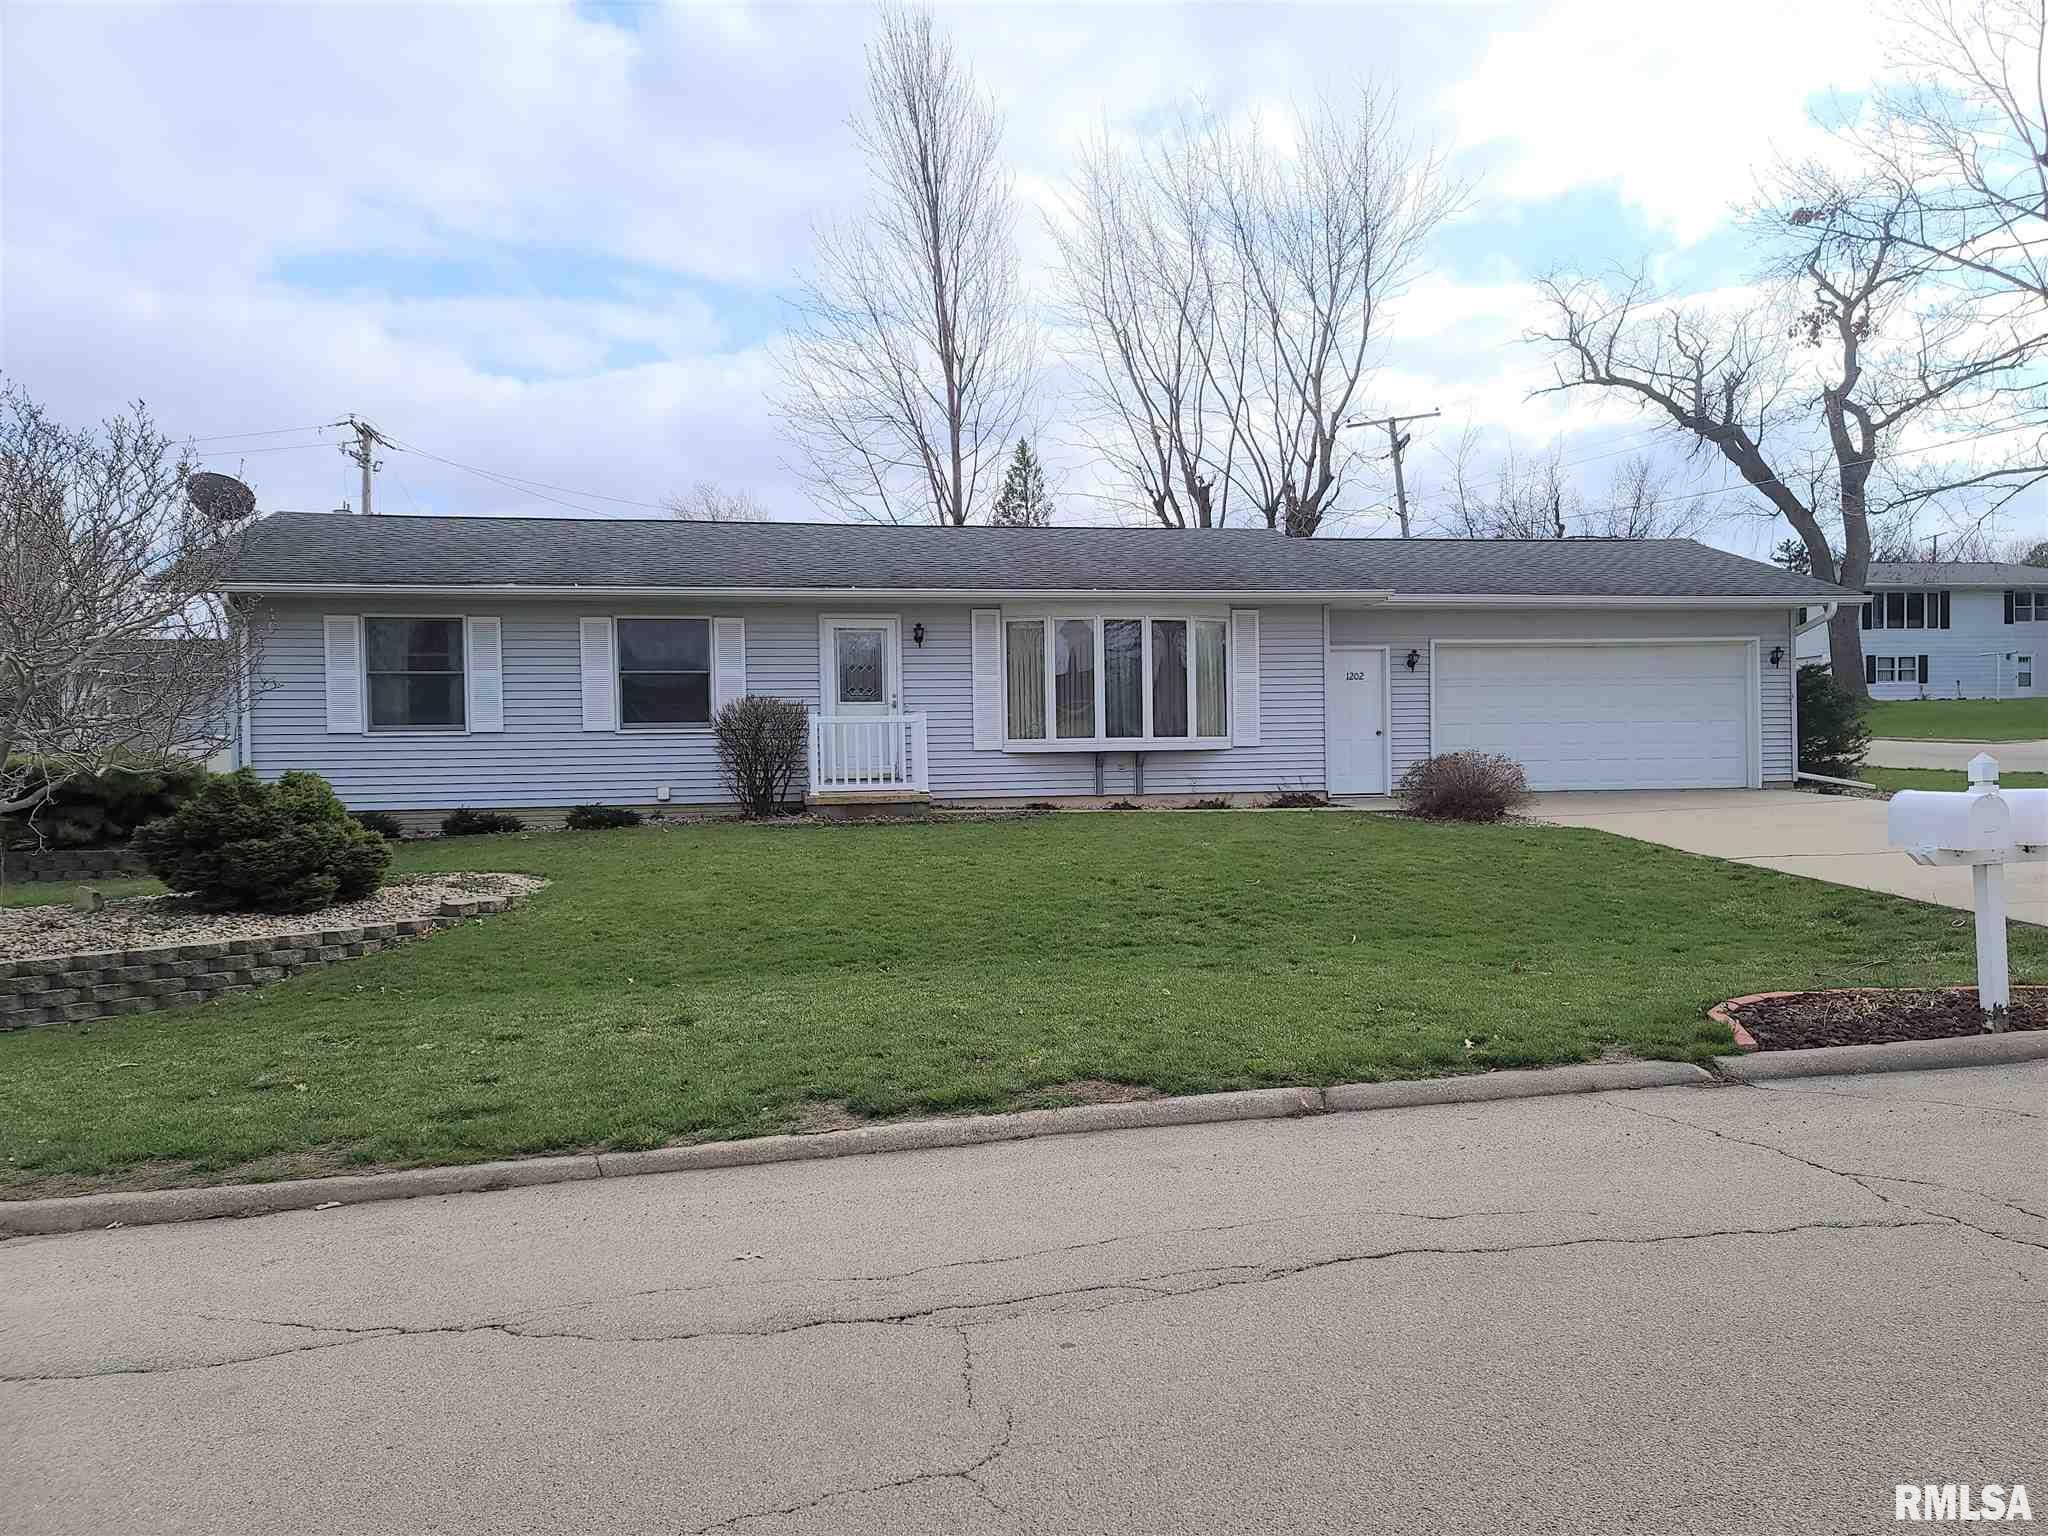 1202 FOWLER Property Photo - Fulton, IL real estate listing